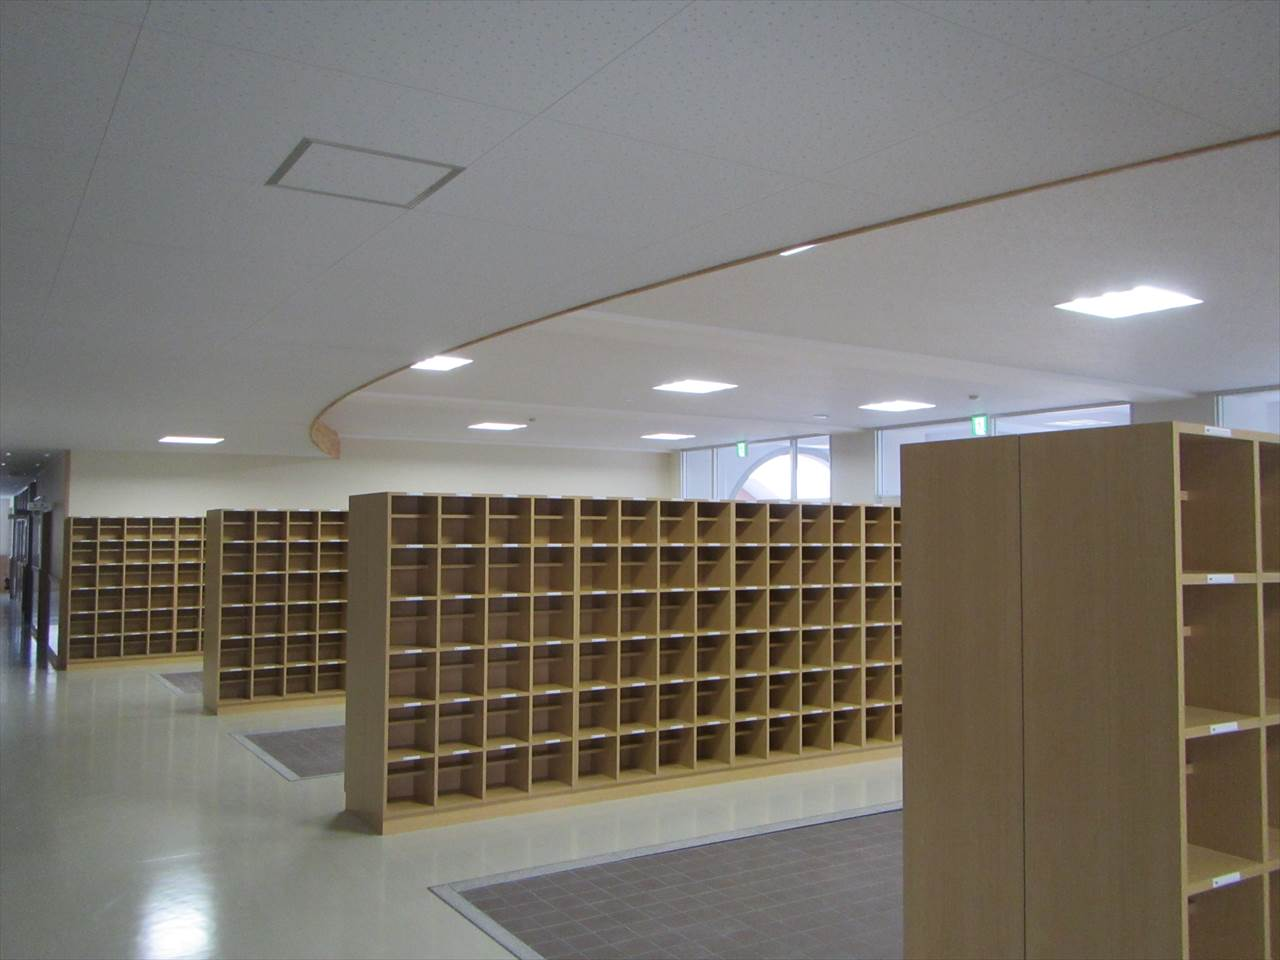 長浜北高校校舎新築その他電気設備工事 画像02